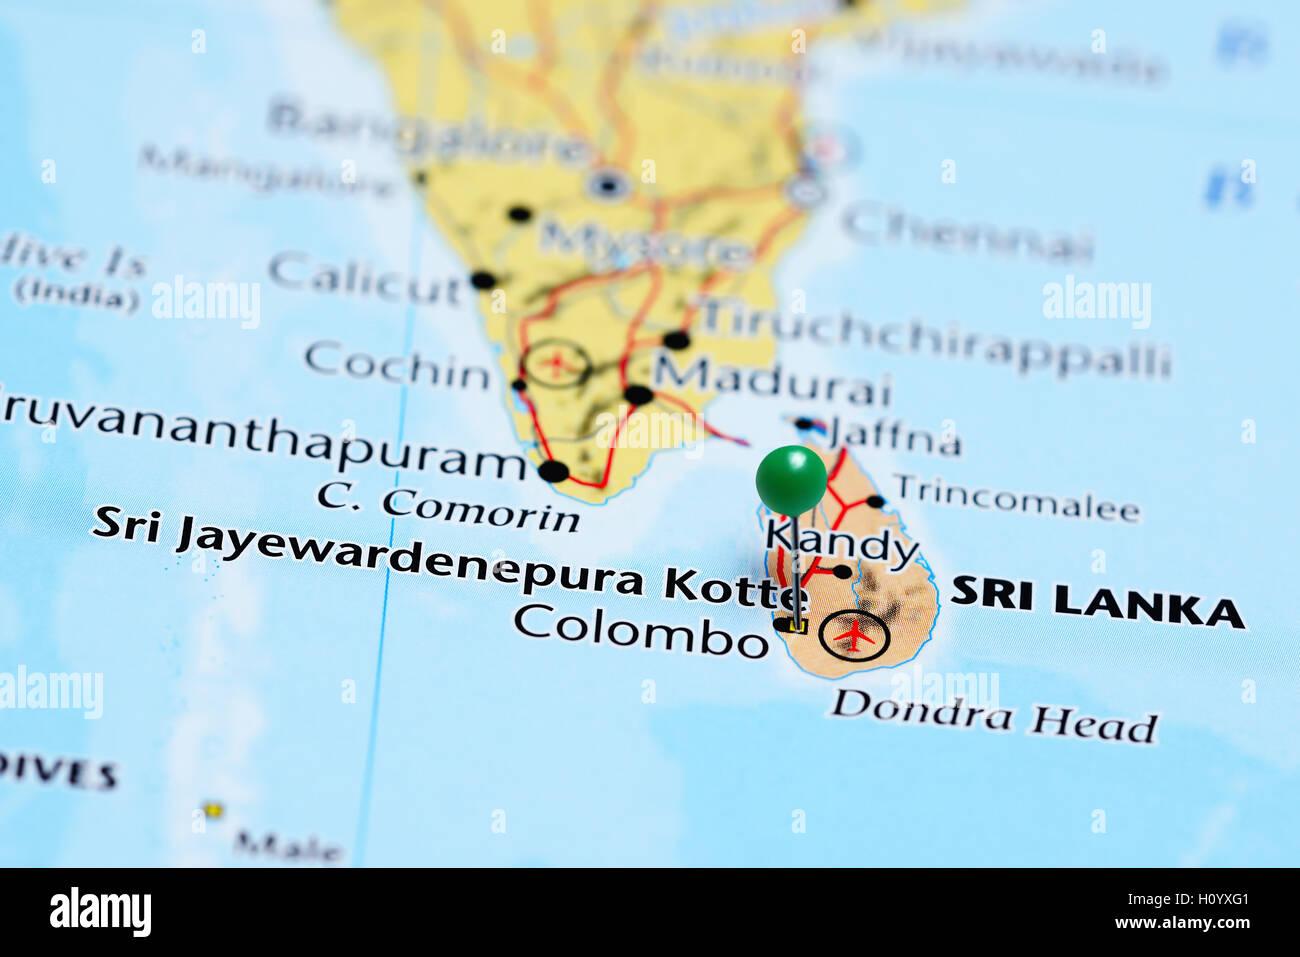 Sri Jayewardenepura Kotte pinned on a map of Sri Lanka Stock Photo